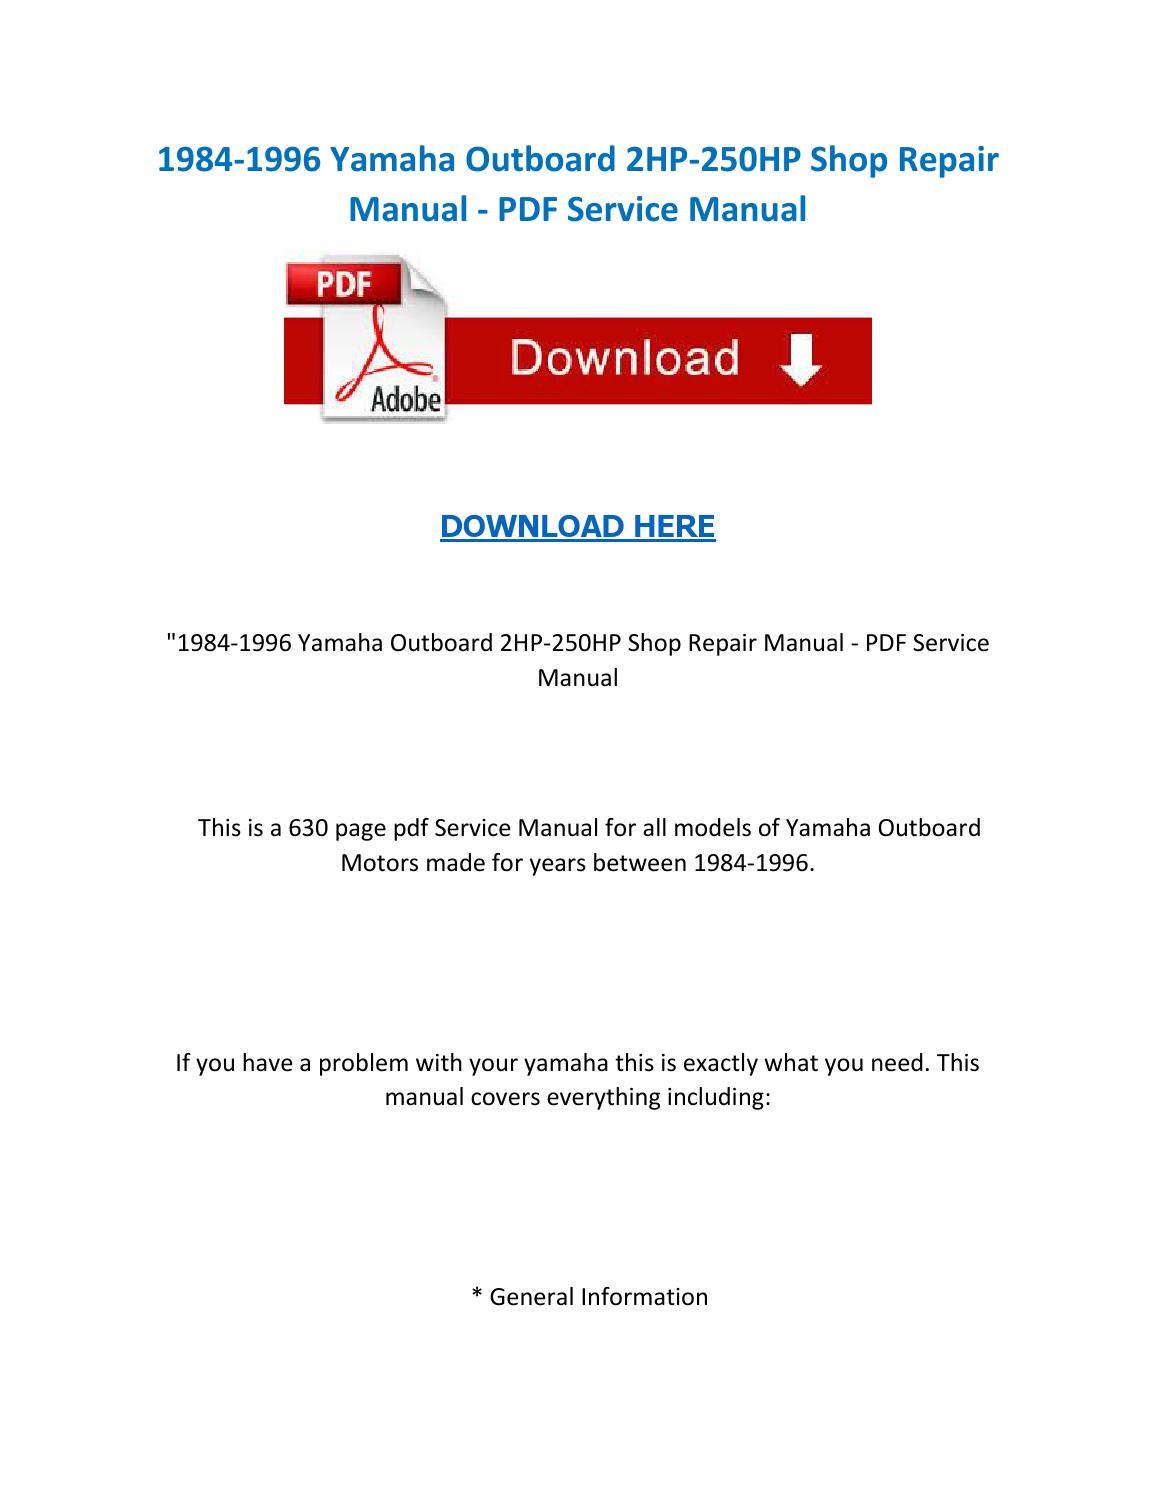 1984 1996 yamaha outboard 2hp 250hp shop repair manual pdf service manual  by ServiceManuals - issuu